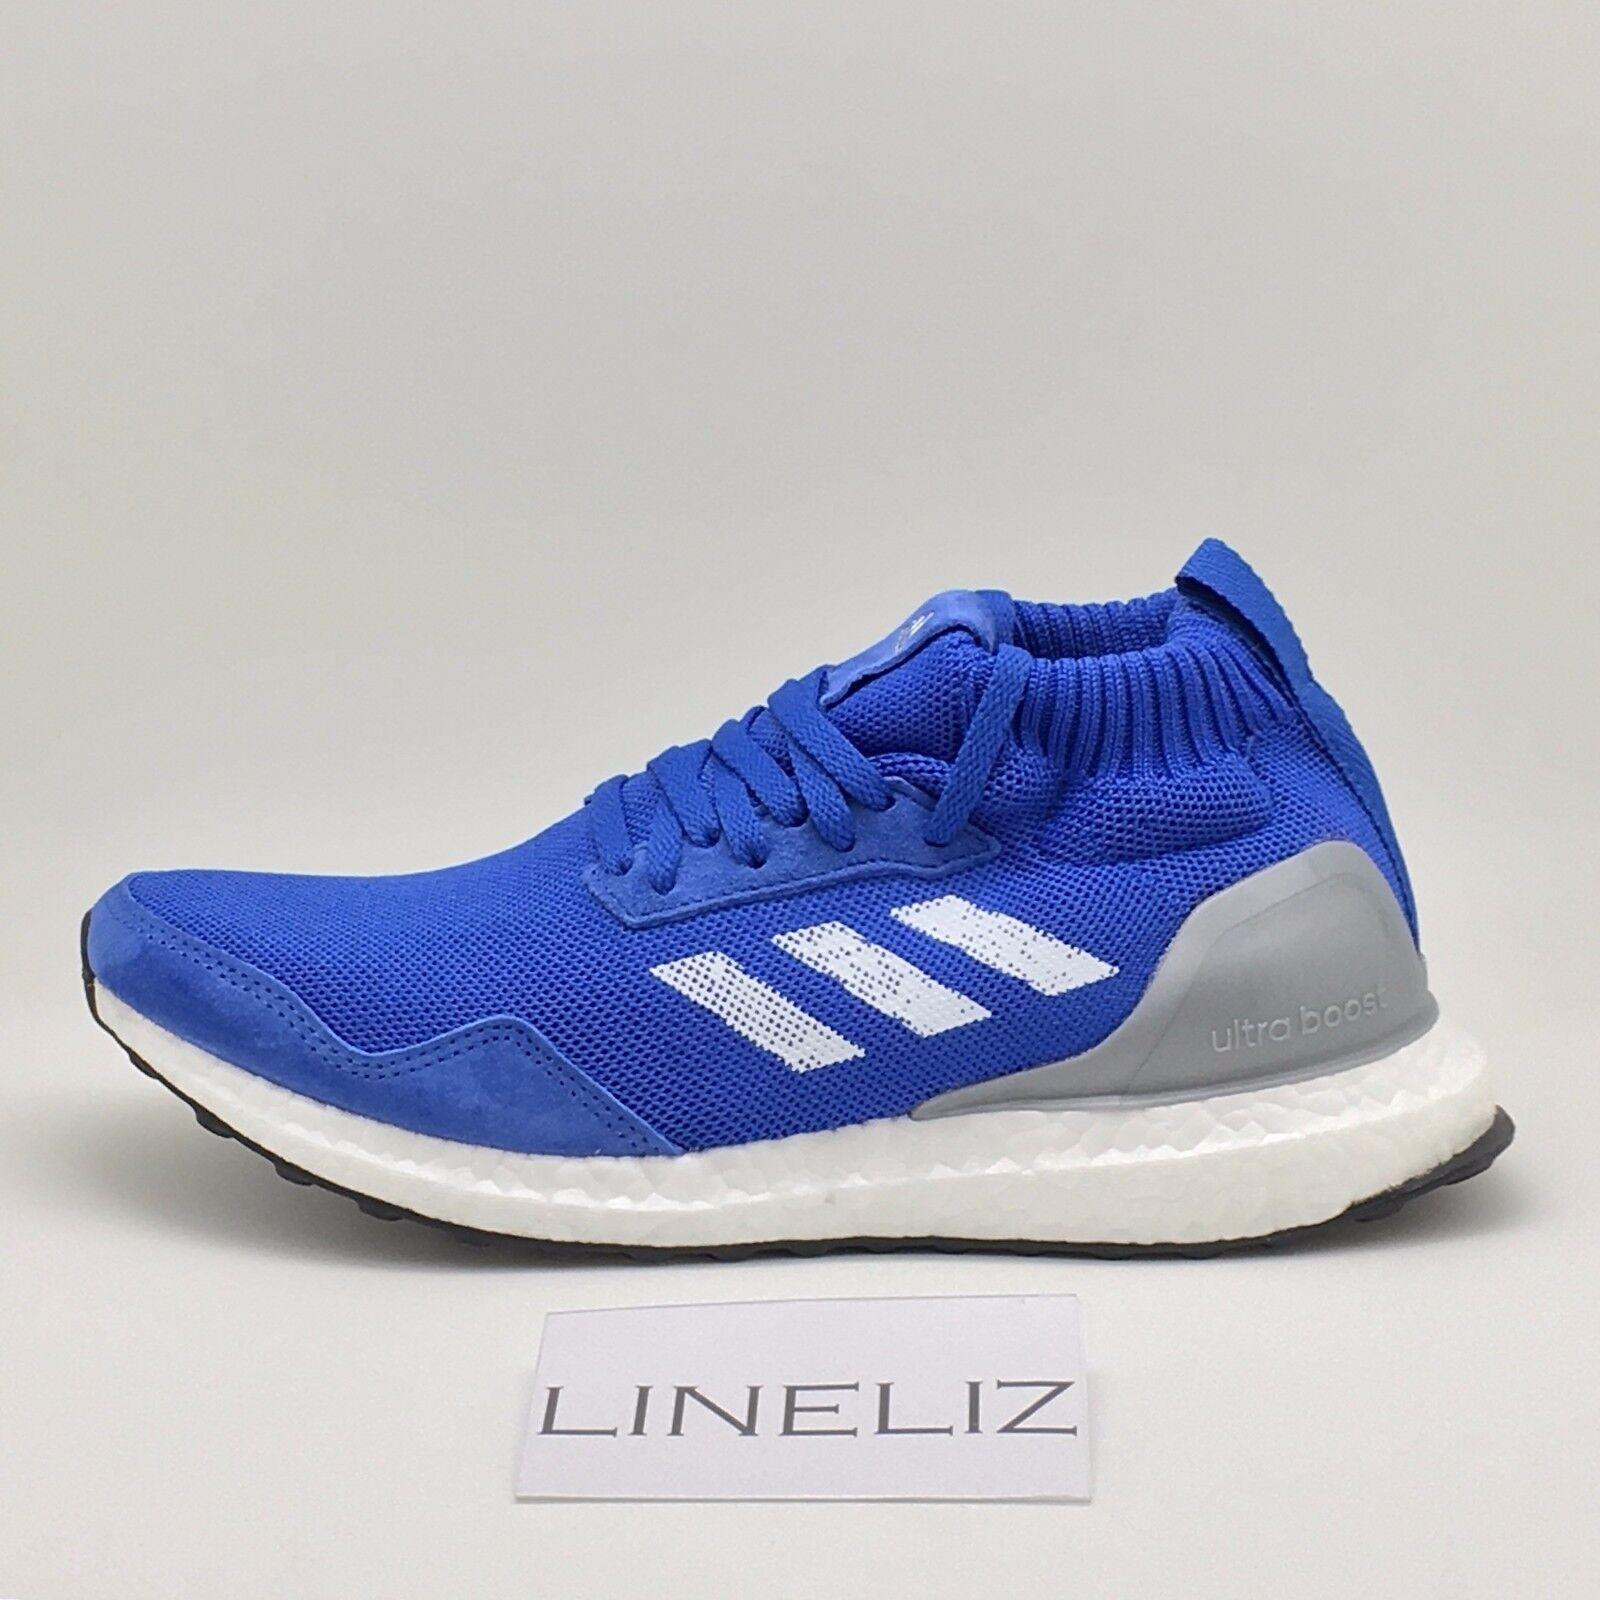 Adidas Consortium Ultra Boost Mid Thru tiempo Tallas 5.5 correr Thru Mid 6 6.5 10 BY3056 2f4e8f